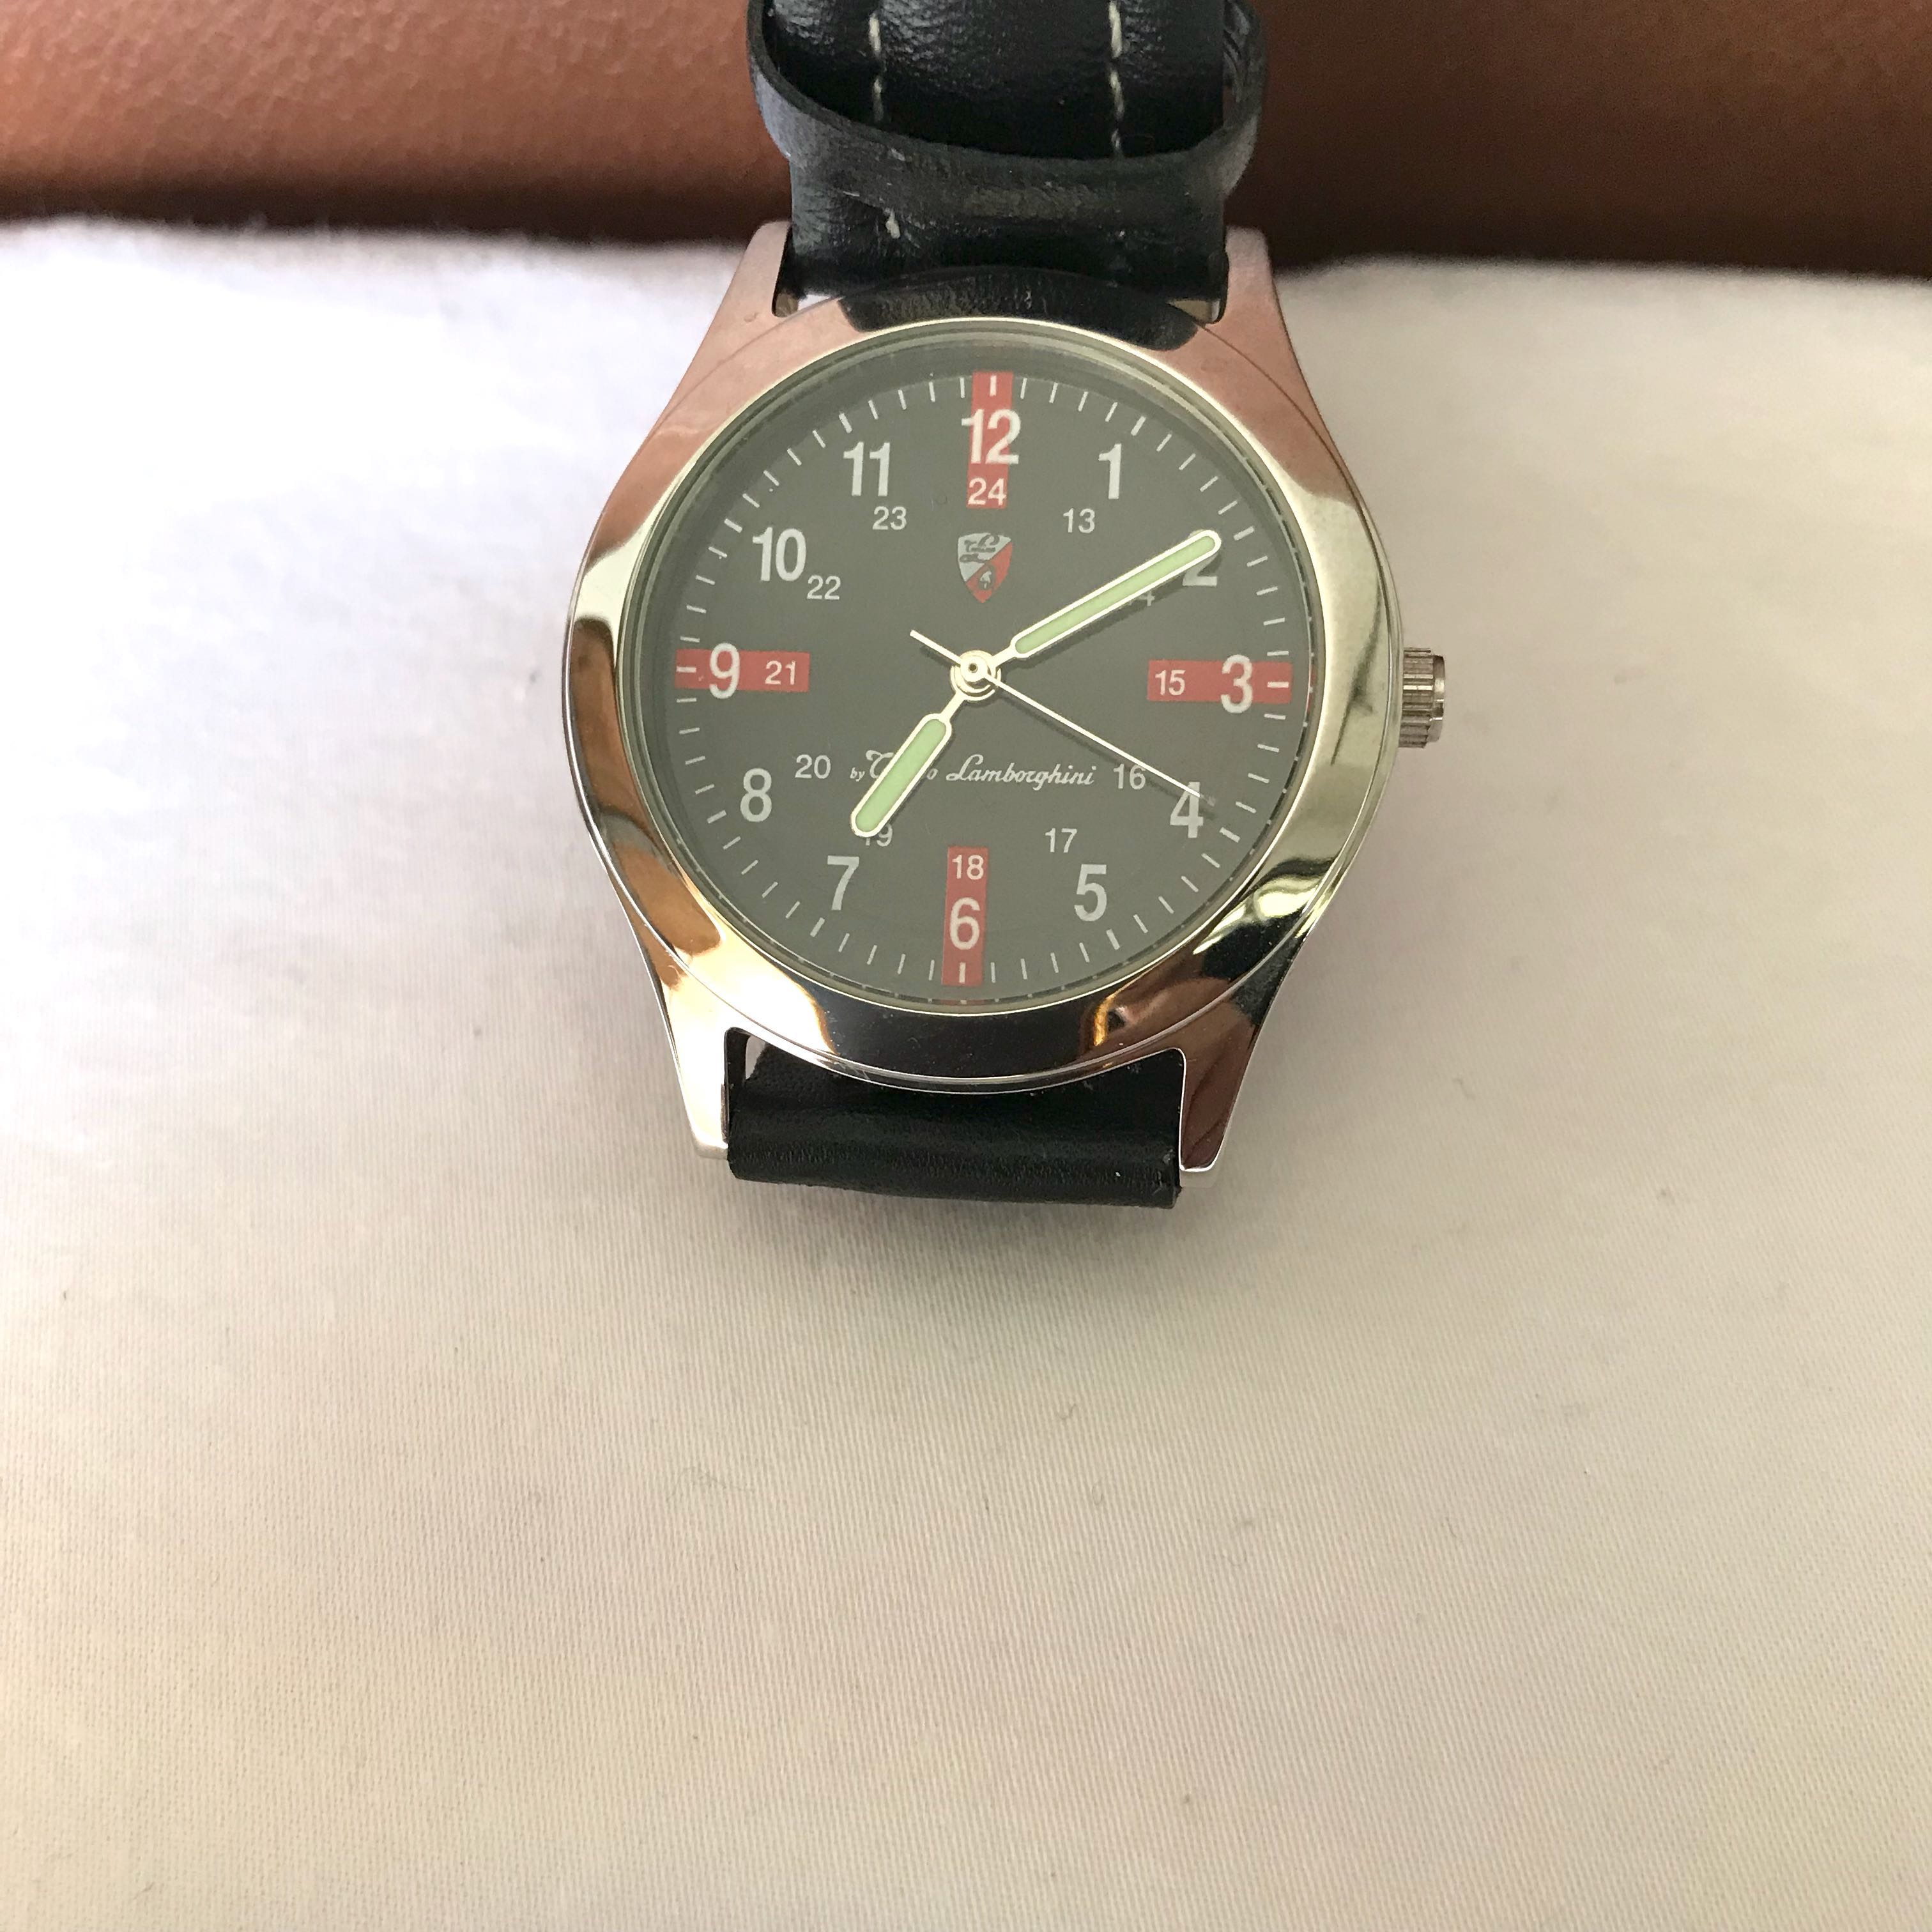 Genuine Stylish Tonino Lamborghini Watch With Pouch Men S Fashion